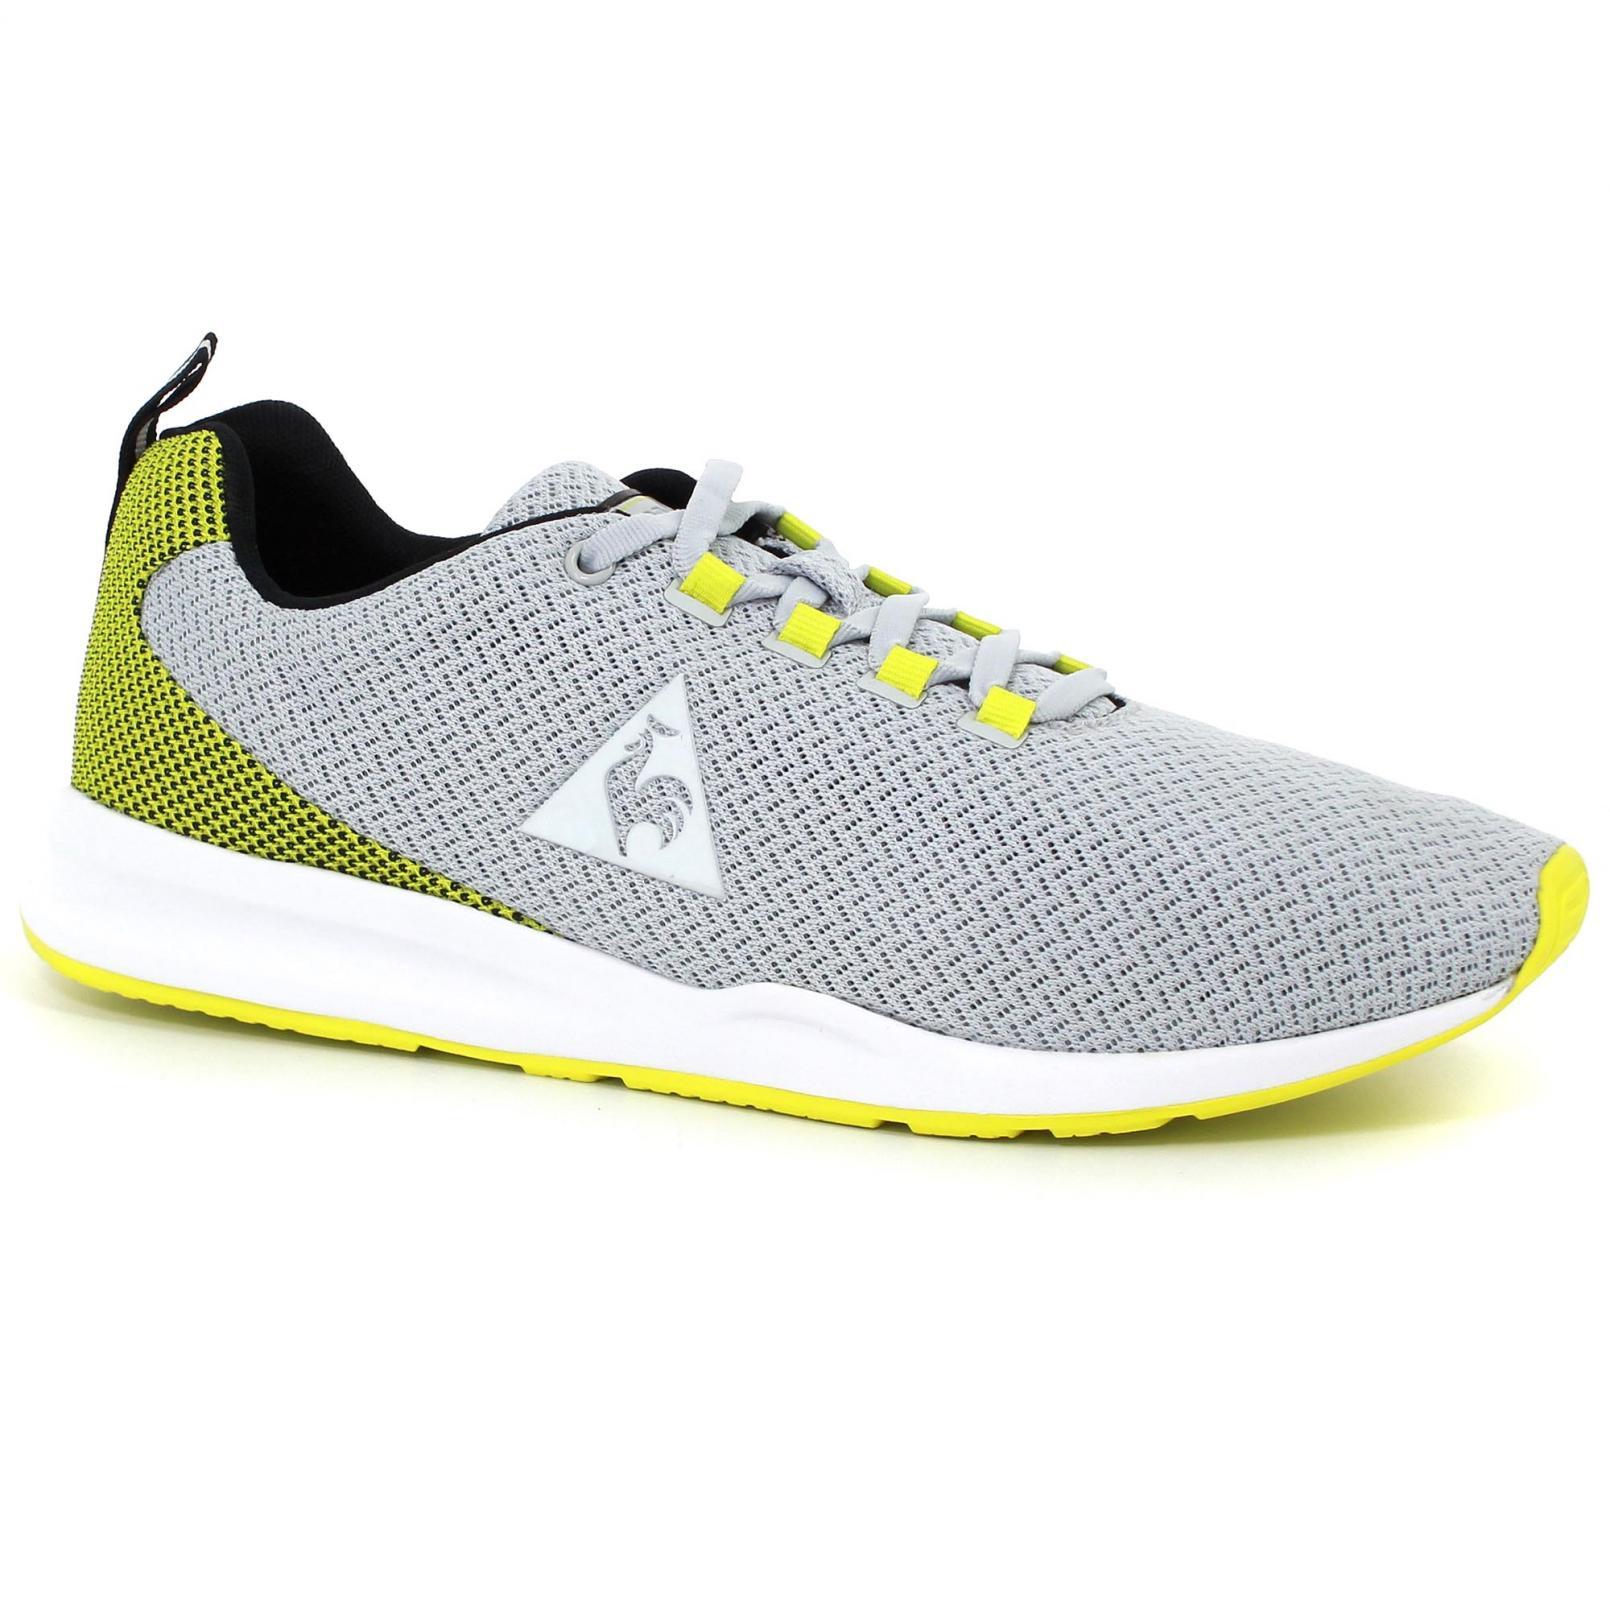 Shoes – Le Coq Sportif Techracer Engineered Mesh Grey/Yellow